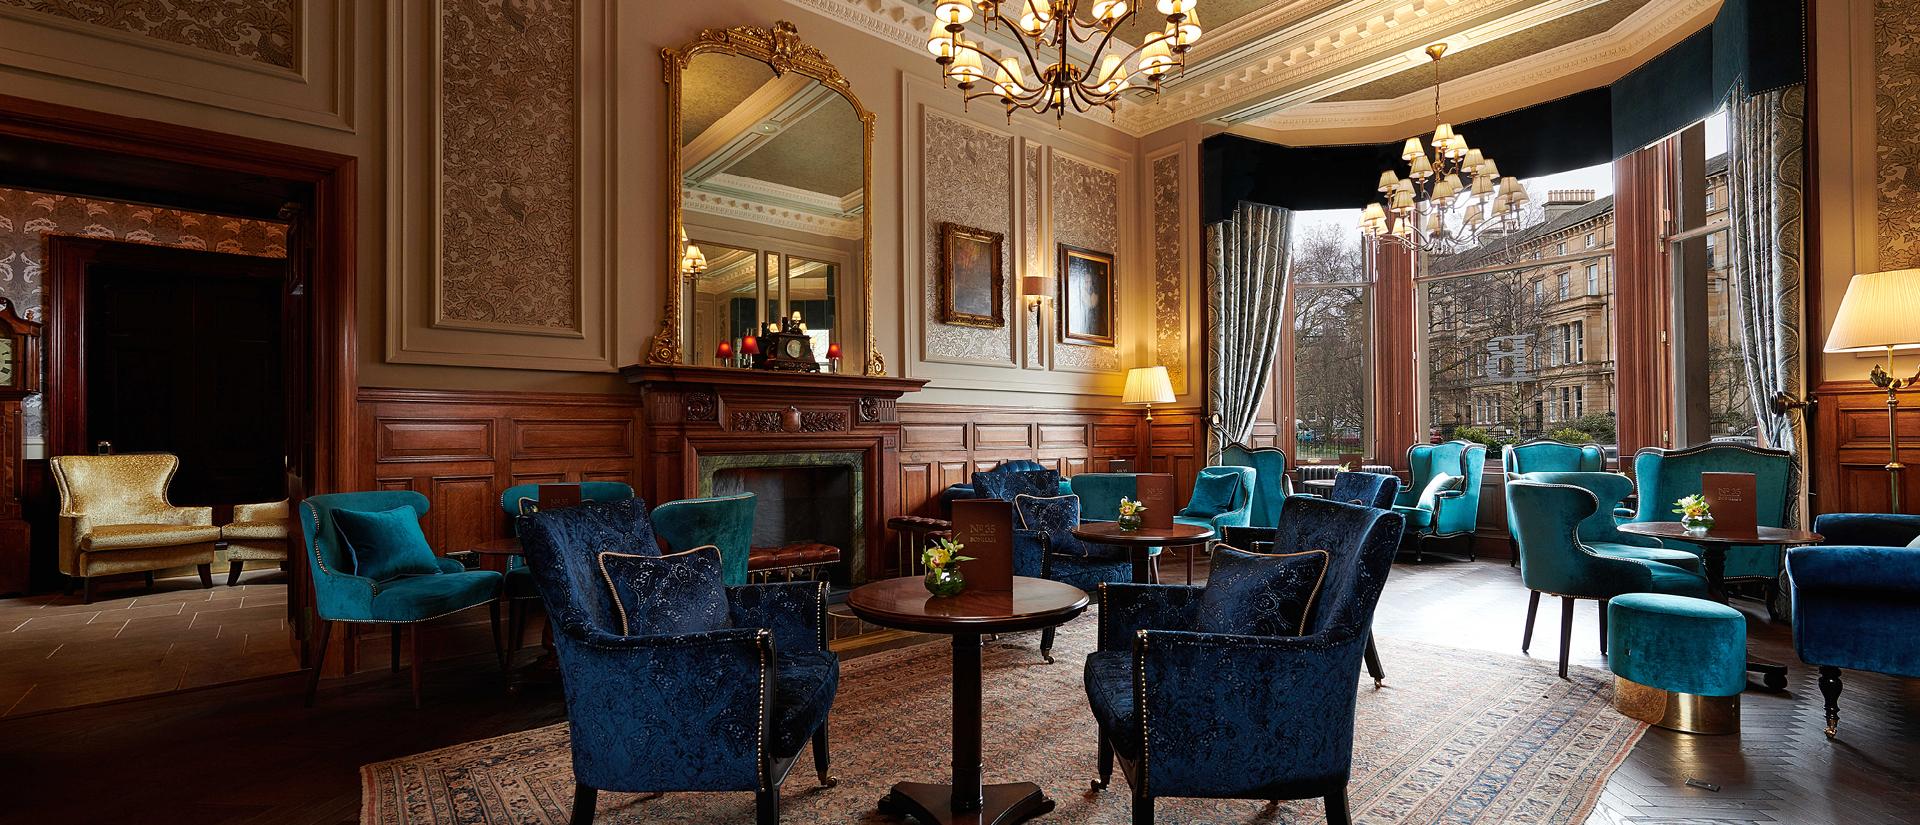 About The Bonham Hotel